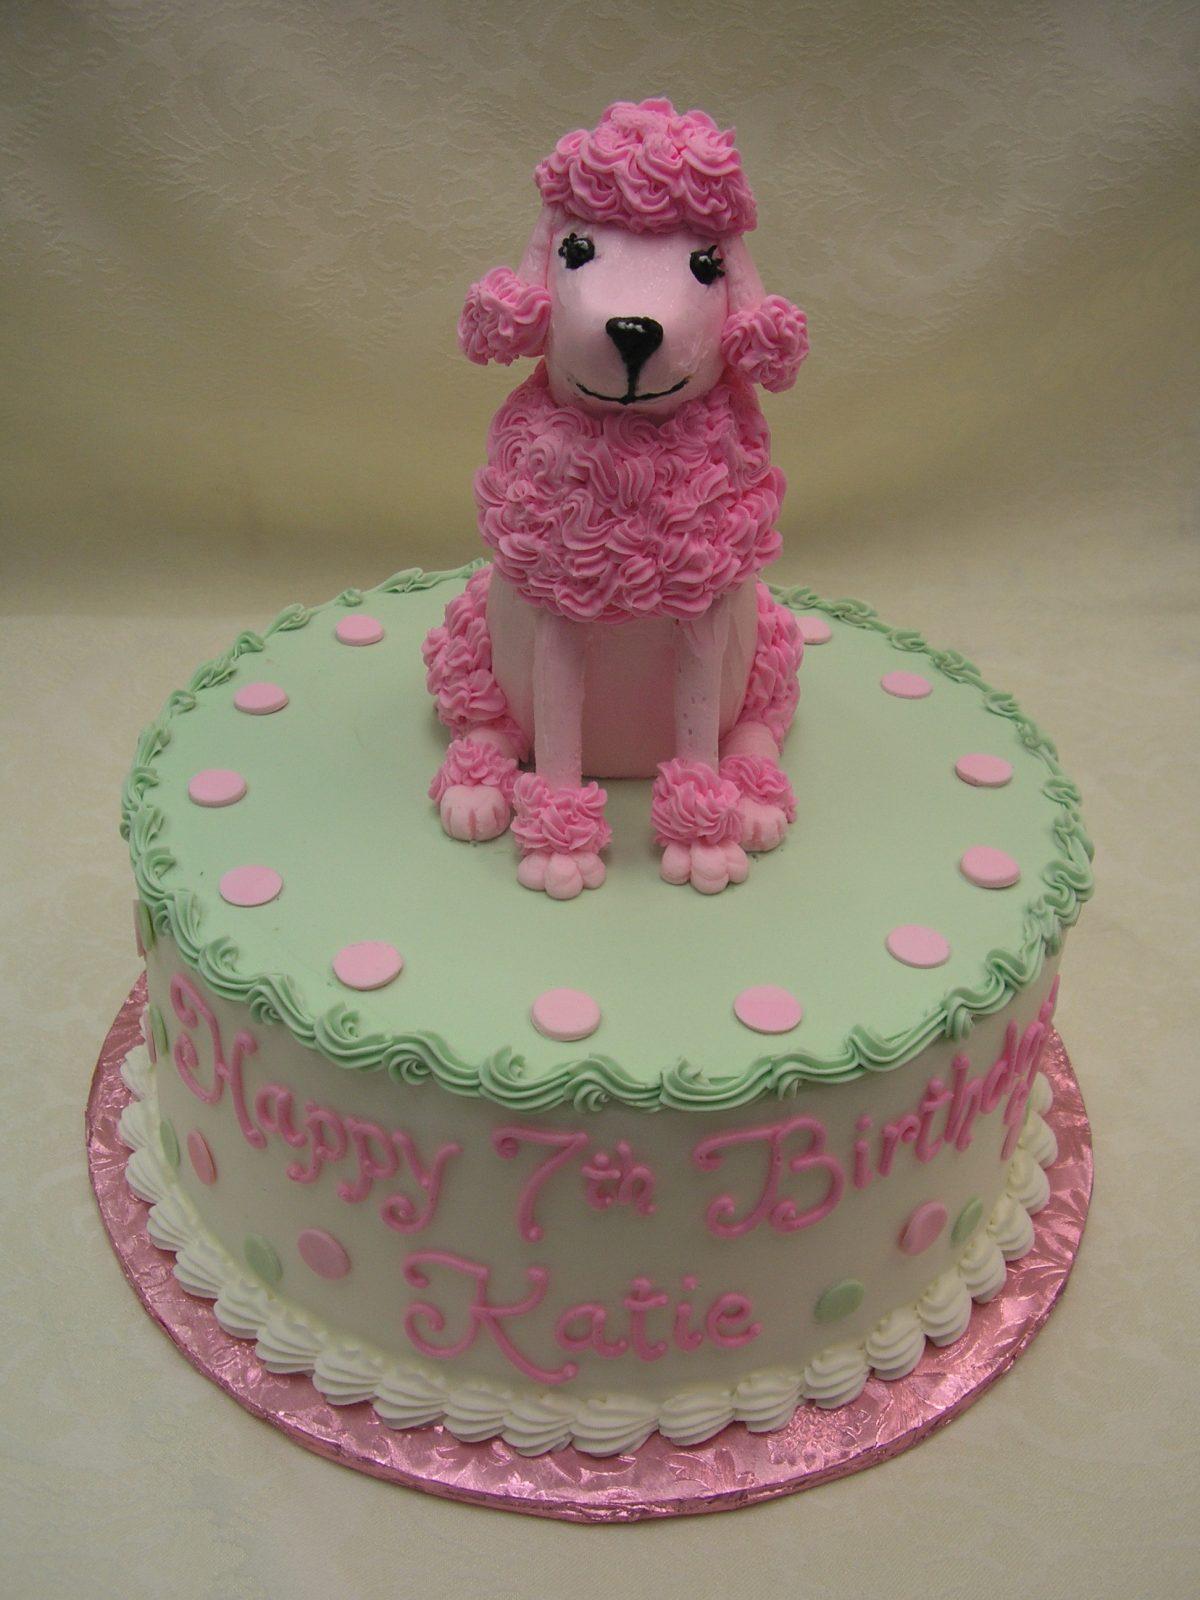 3D pink poodle on cake